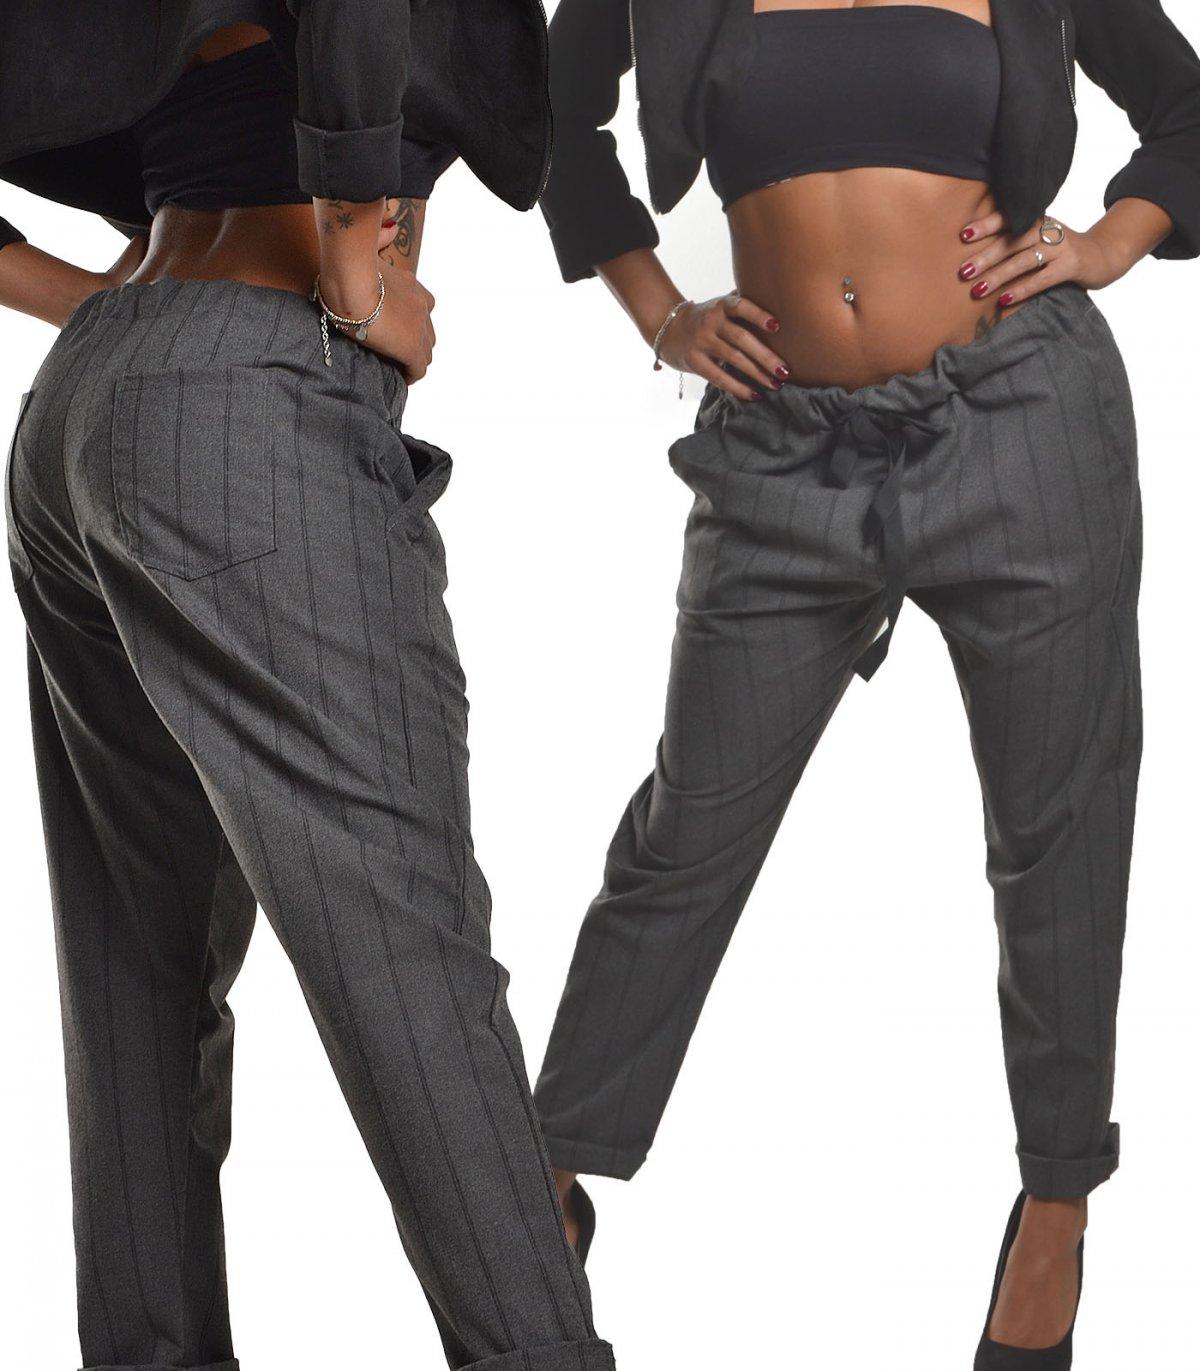 899c23d284 Pantalone donna gessato elastico pence | My Vida